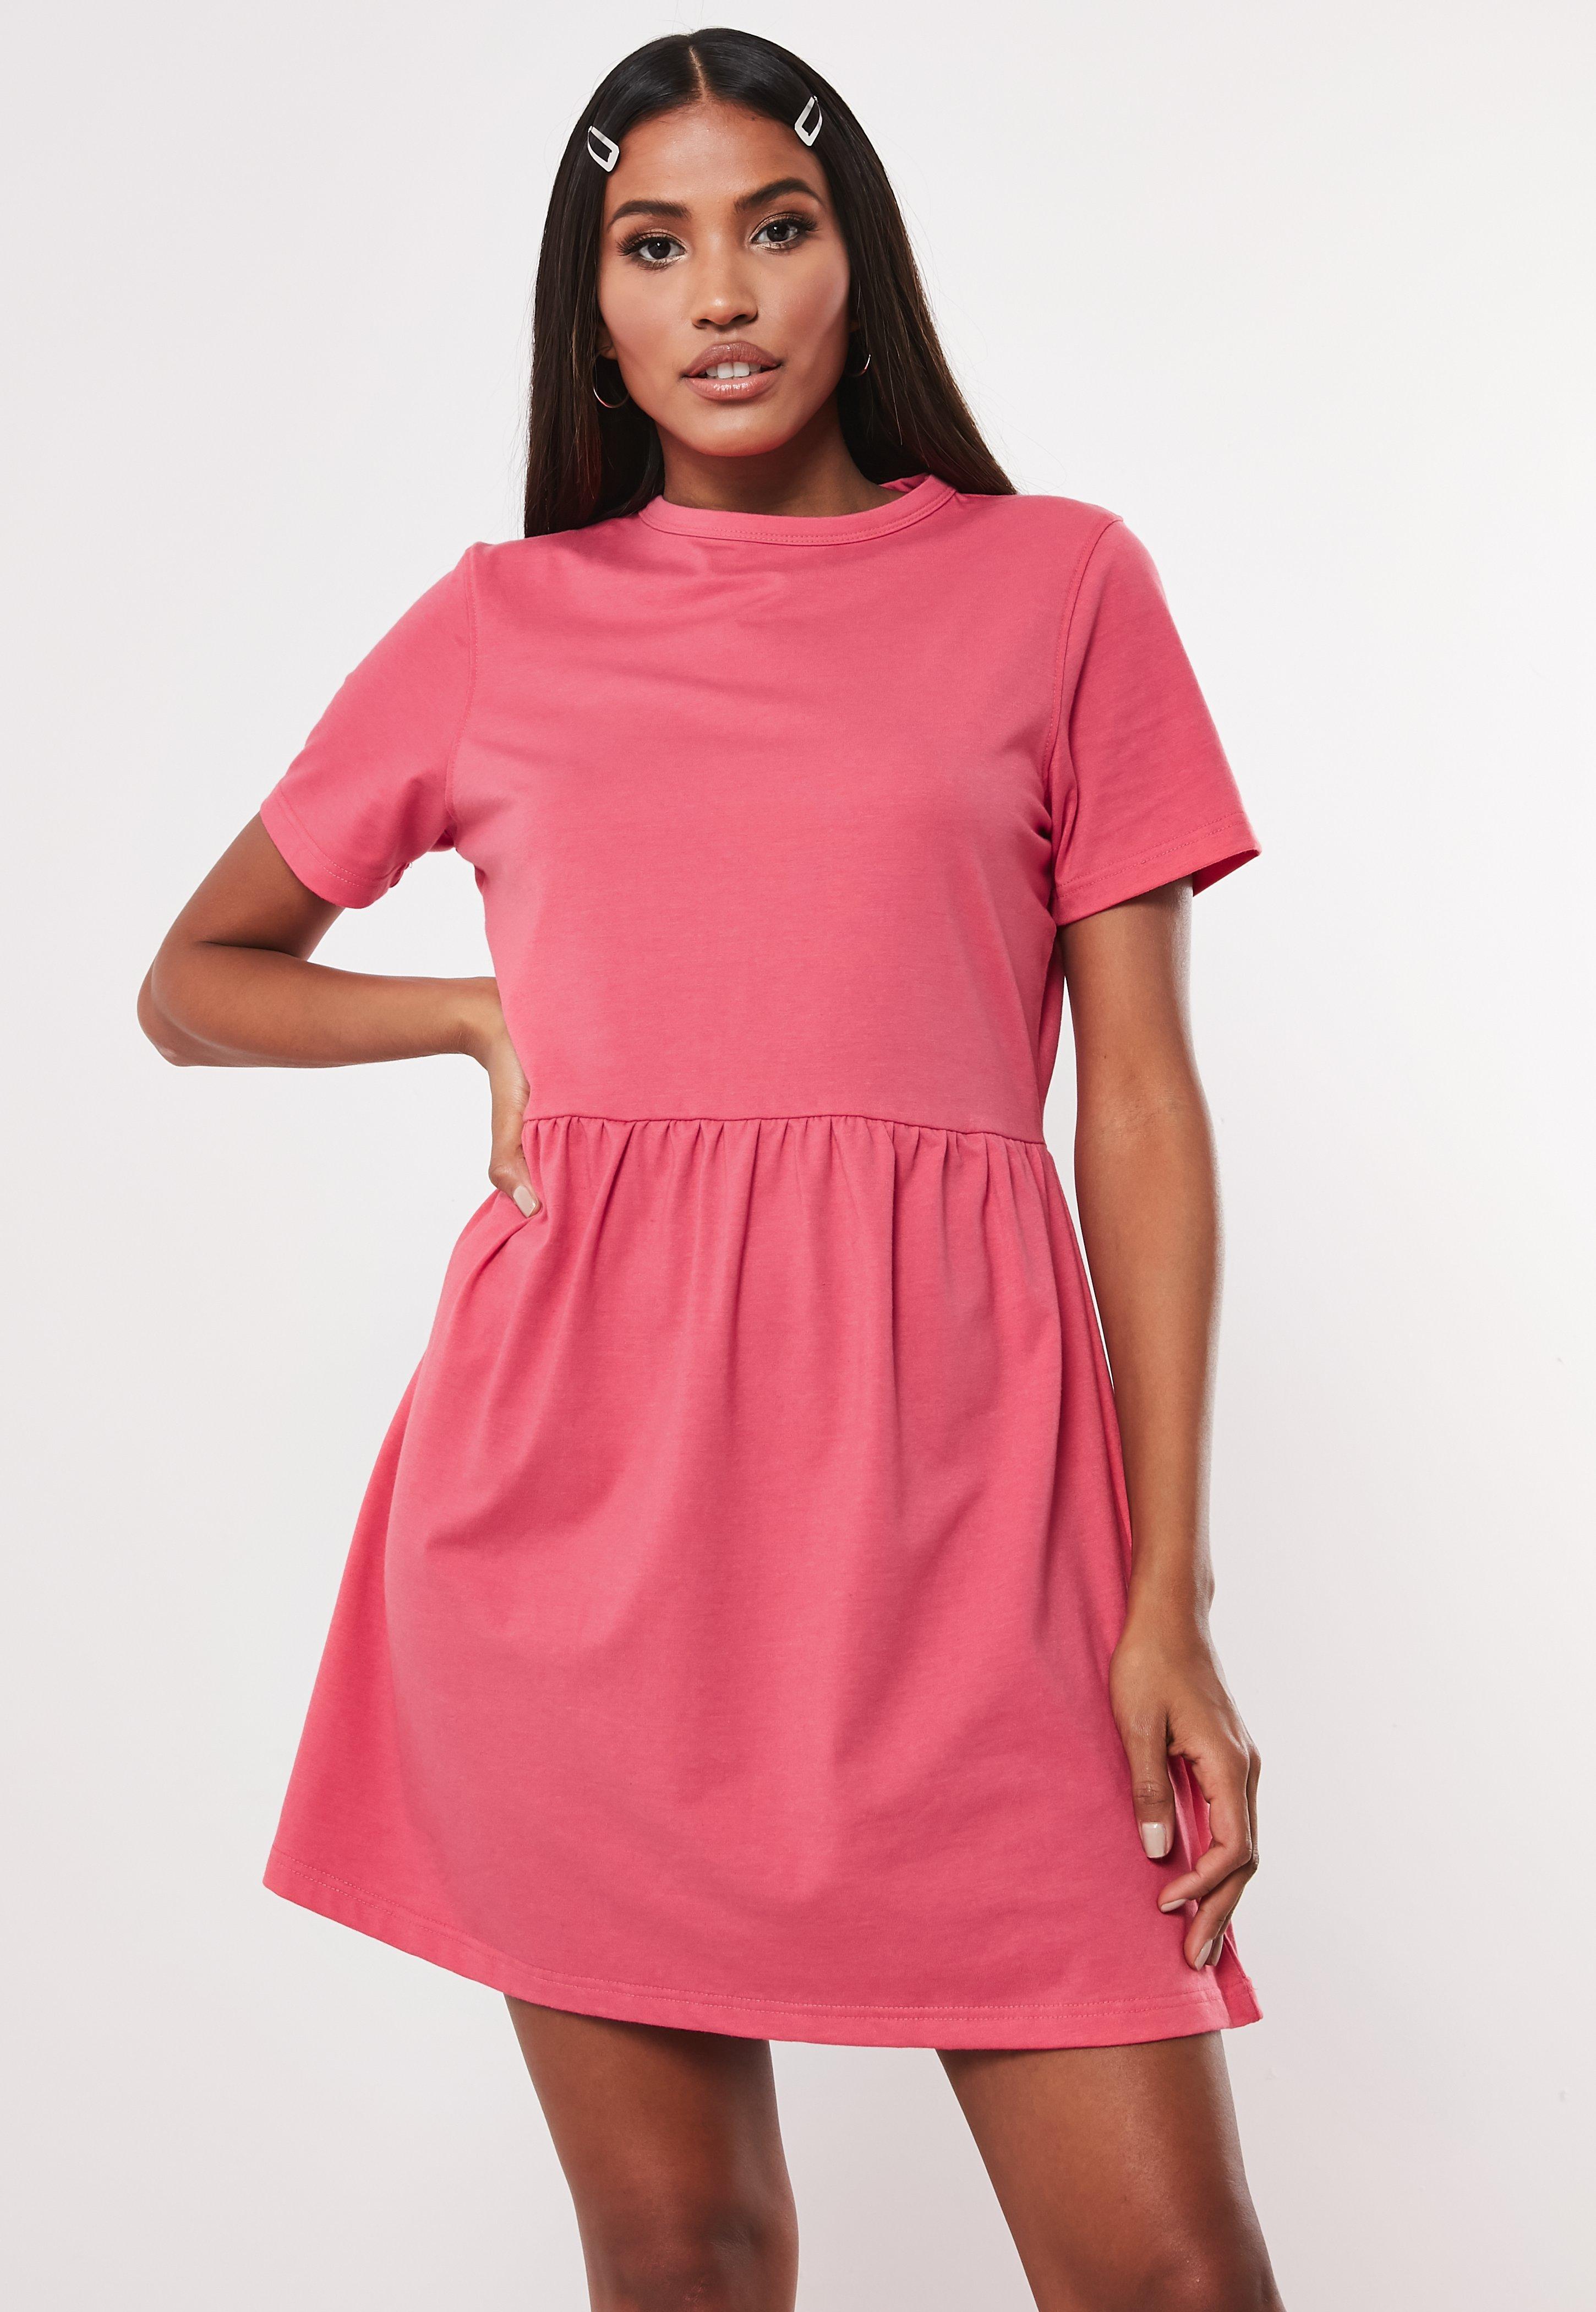 73f14a2b69 Smock Dresses & Chiffon Swing Smock Dress - Missguided